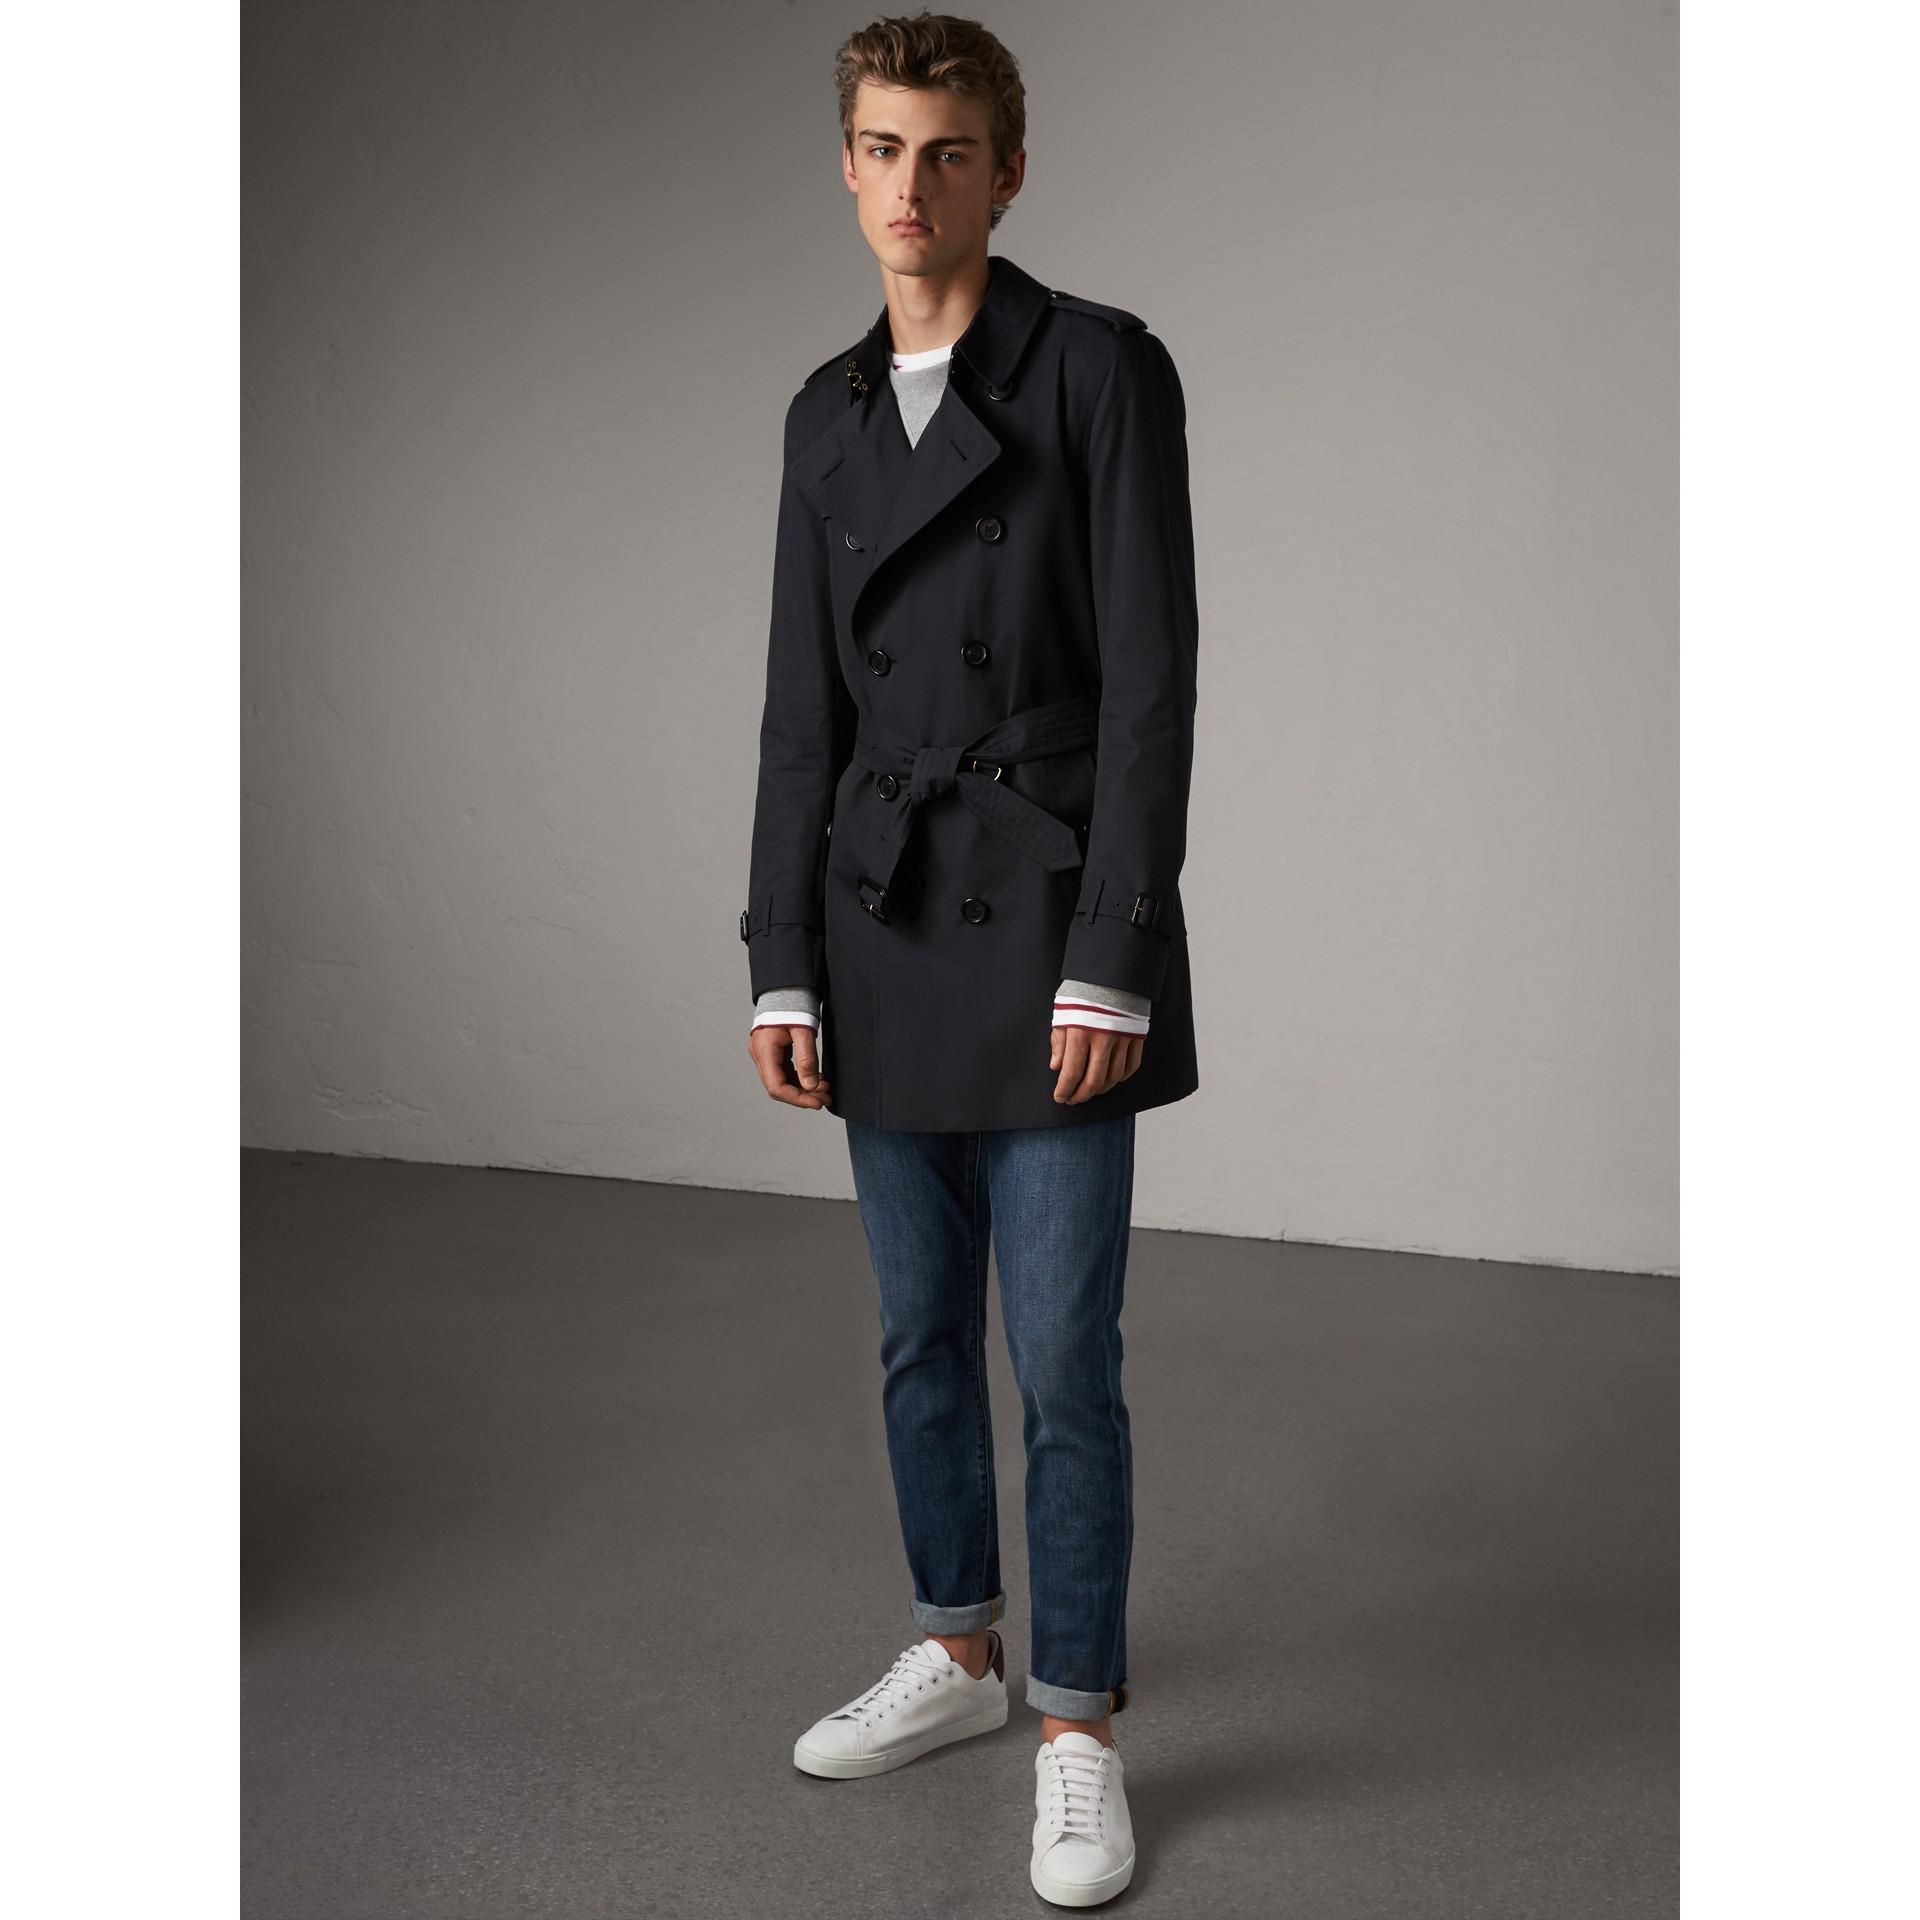 Trench coat Kensington – Trench coat Heritage de longitud media (Azul Marino) - Hombre | Burberry - imagen de la galería 8